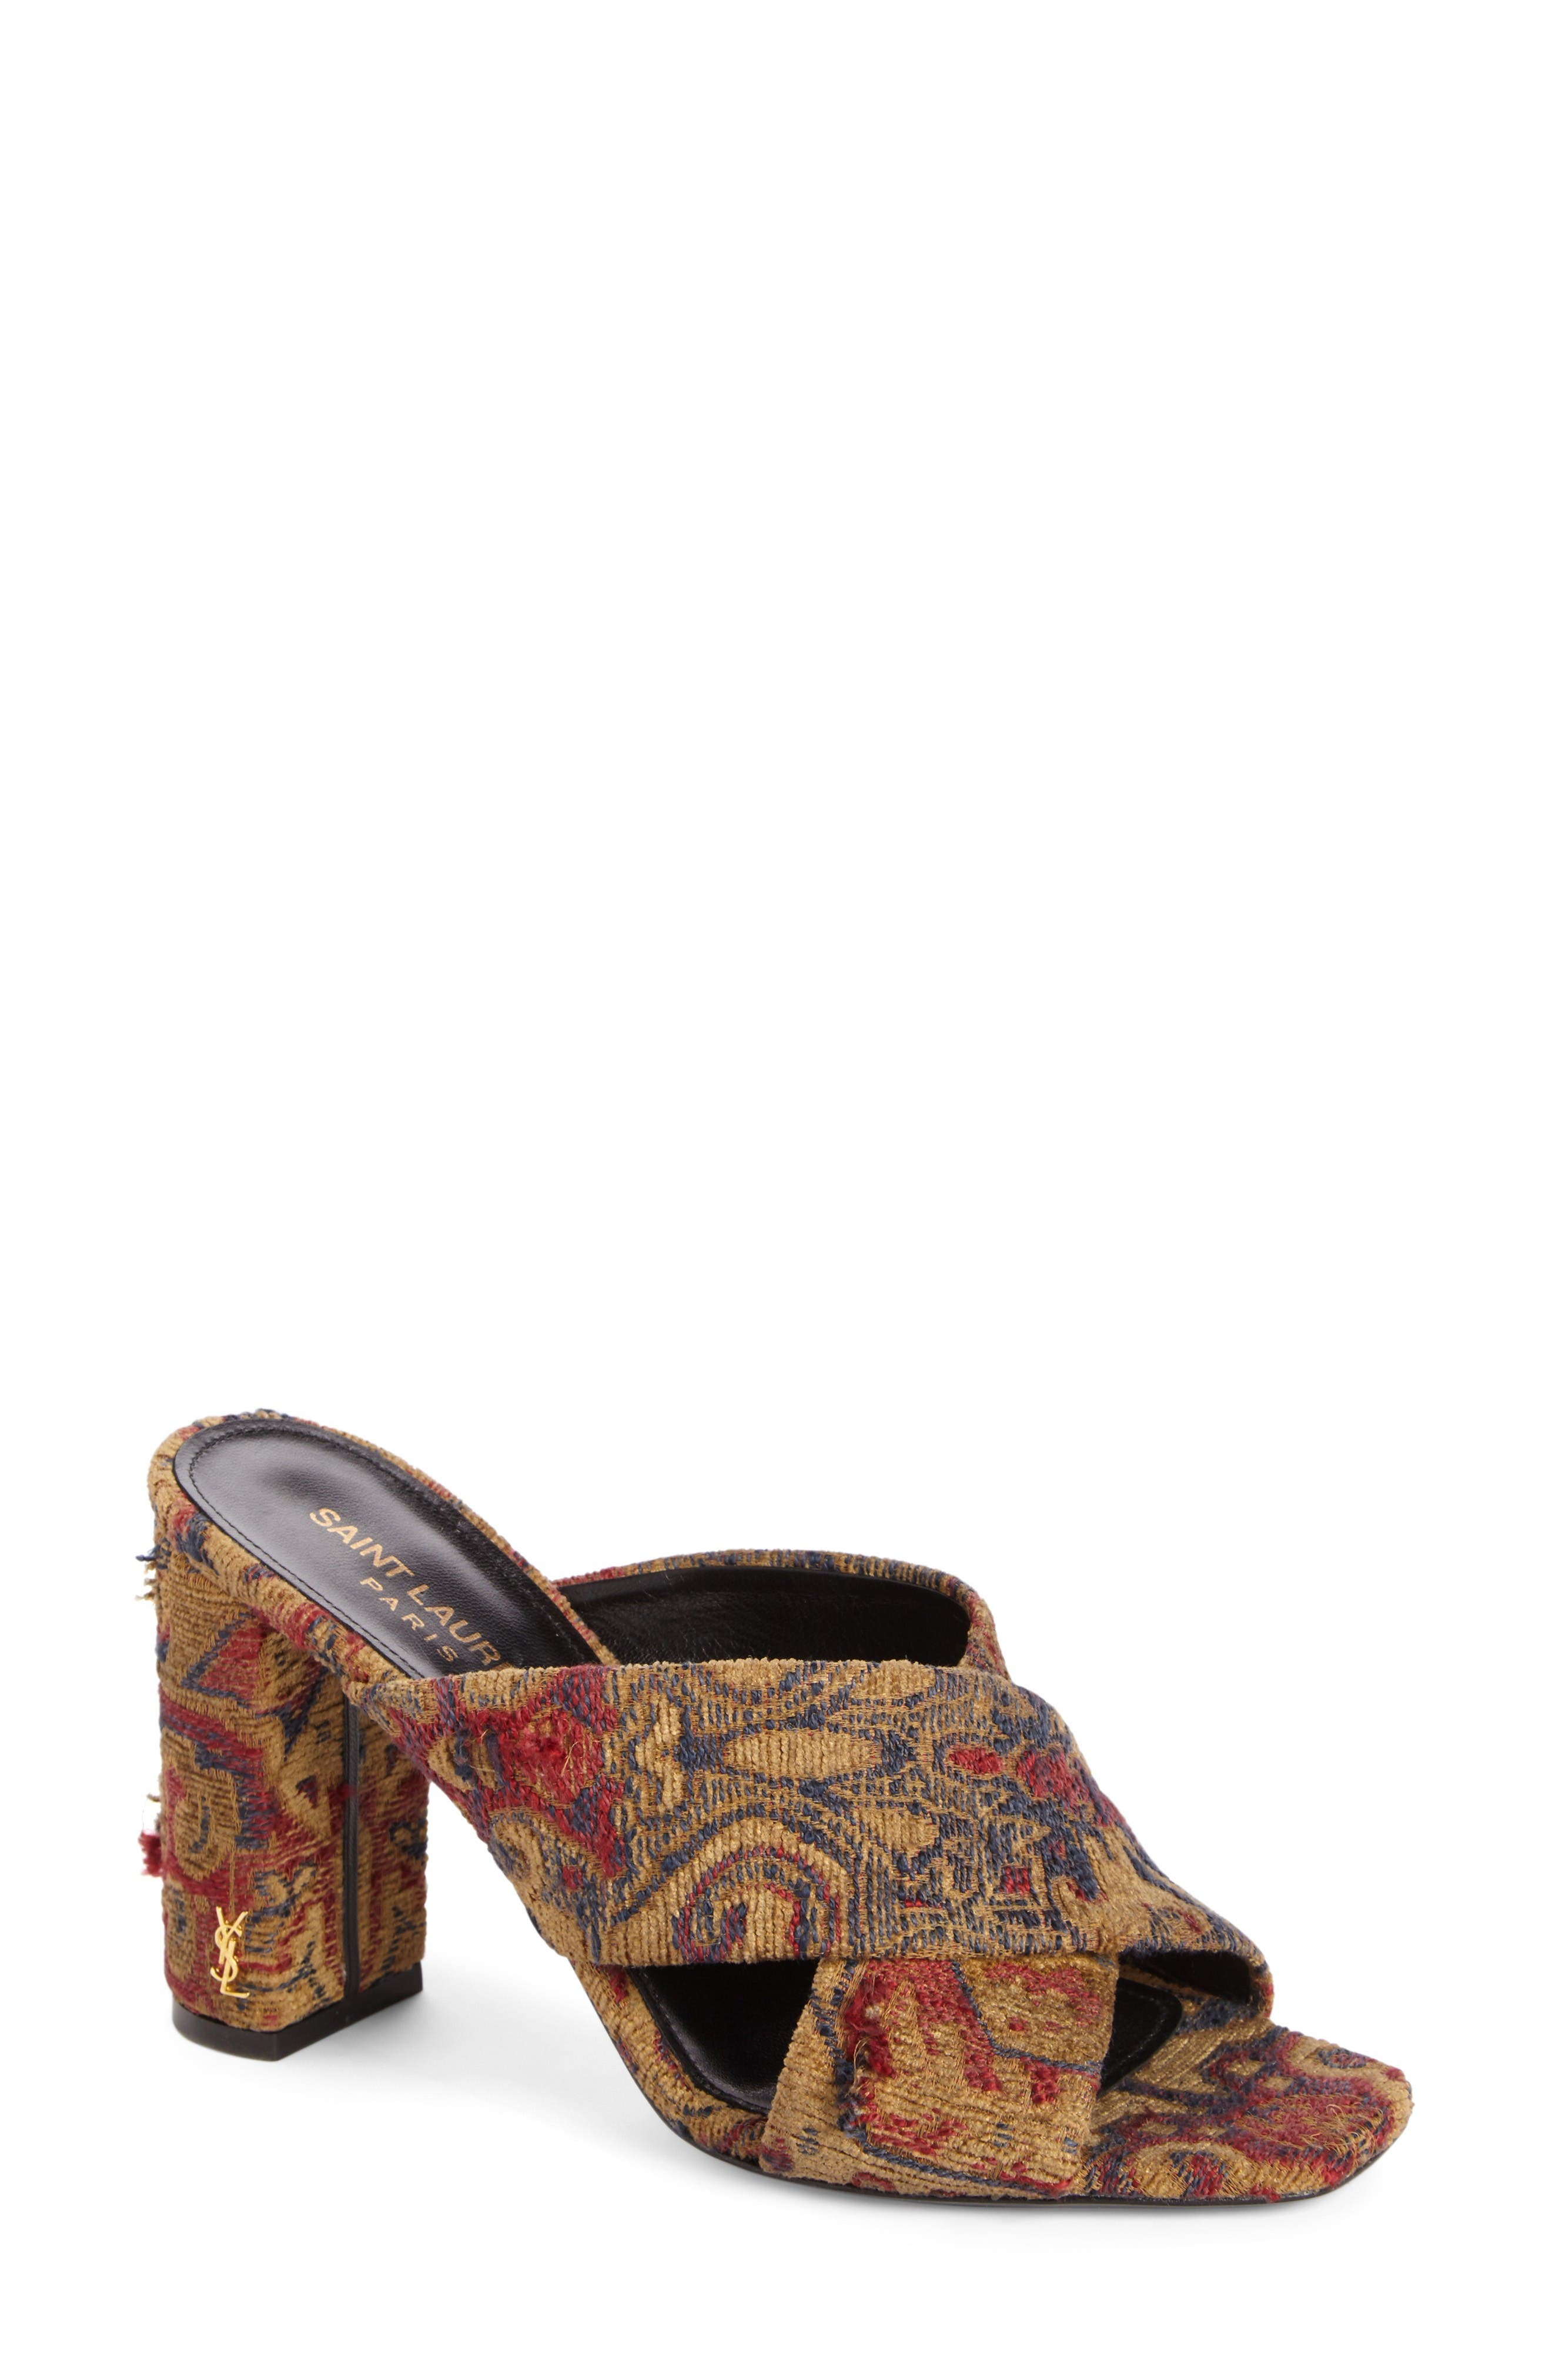 SAINT LAURENT Loulou Slide Sandal